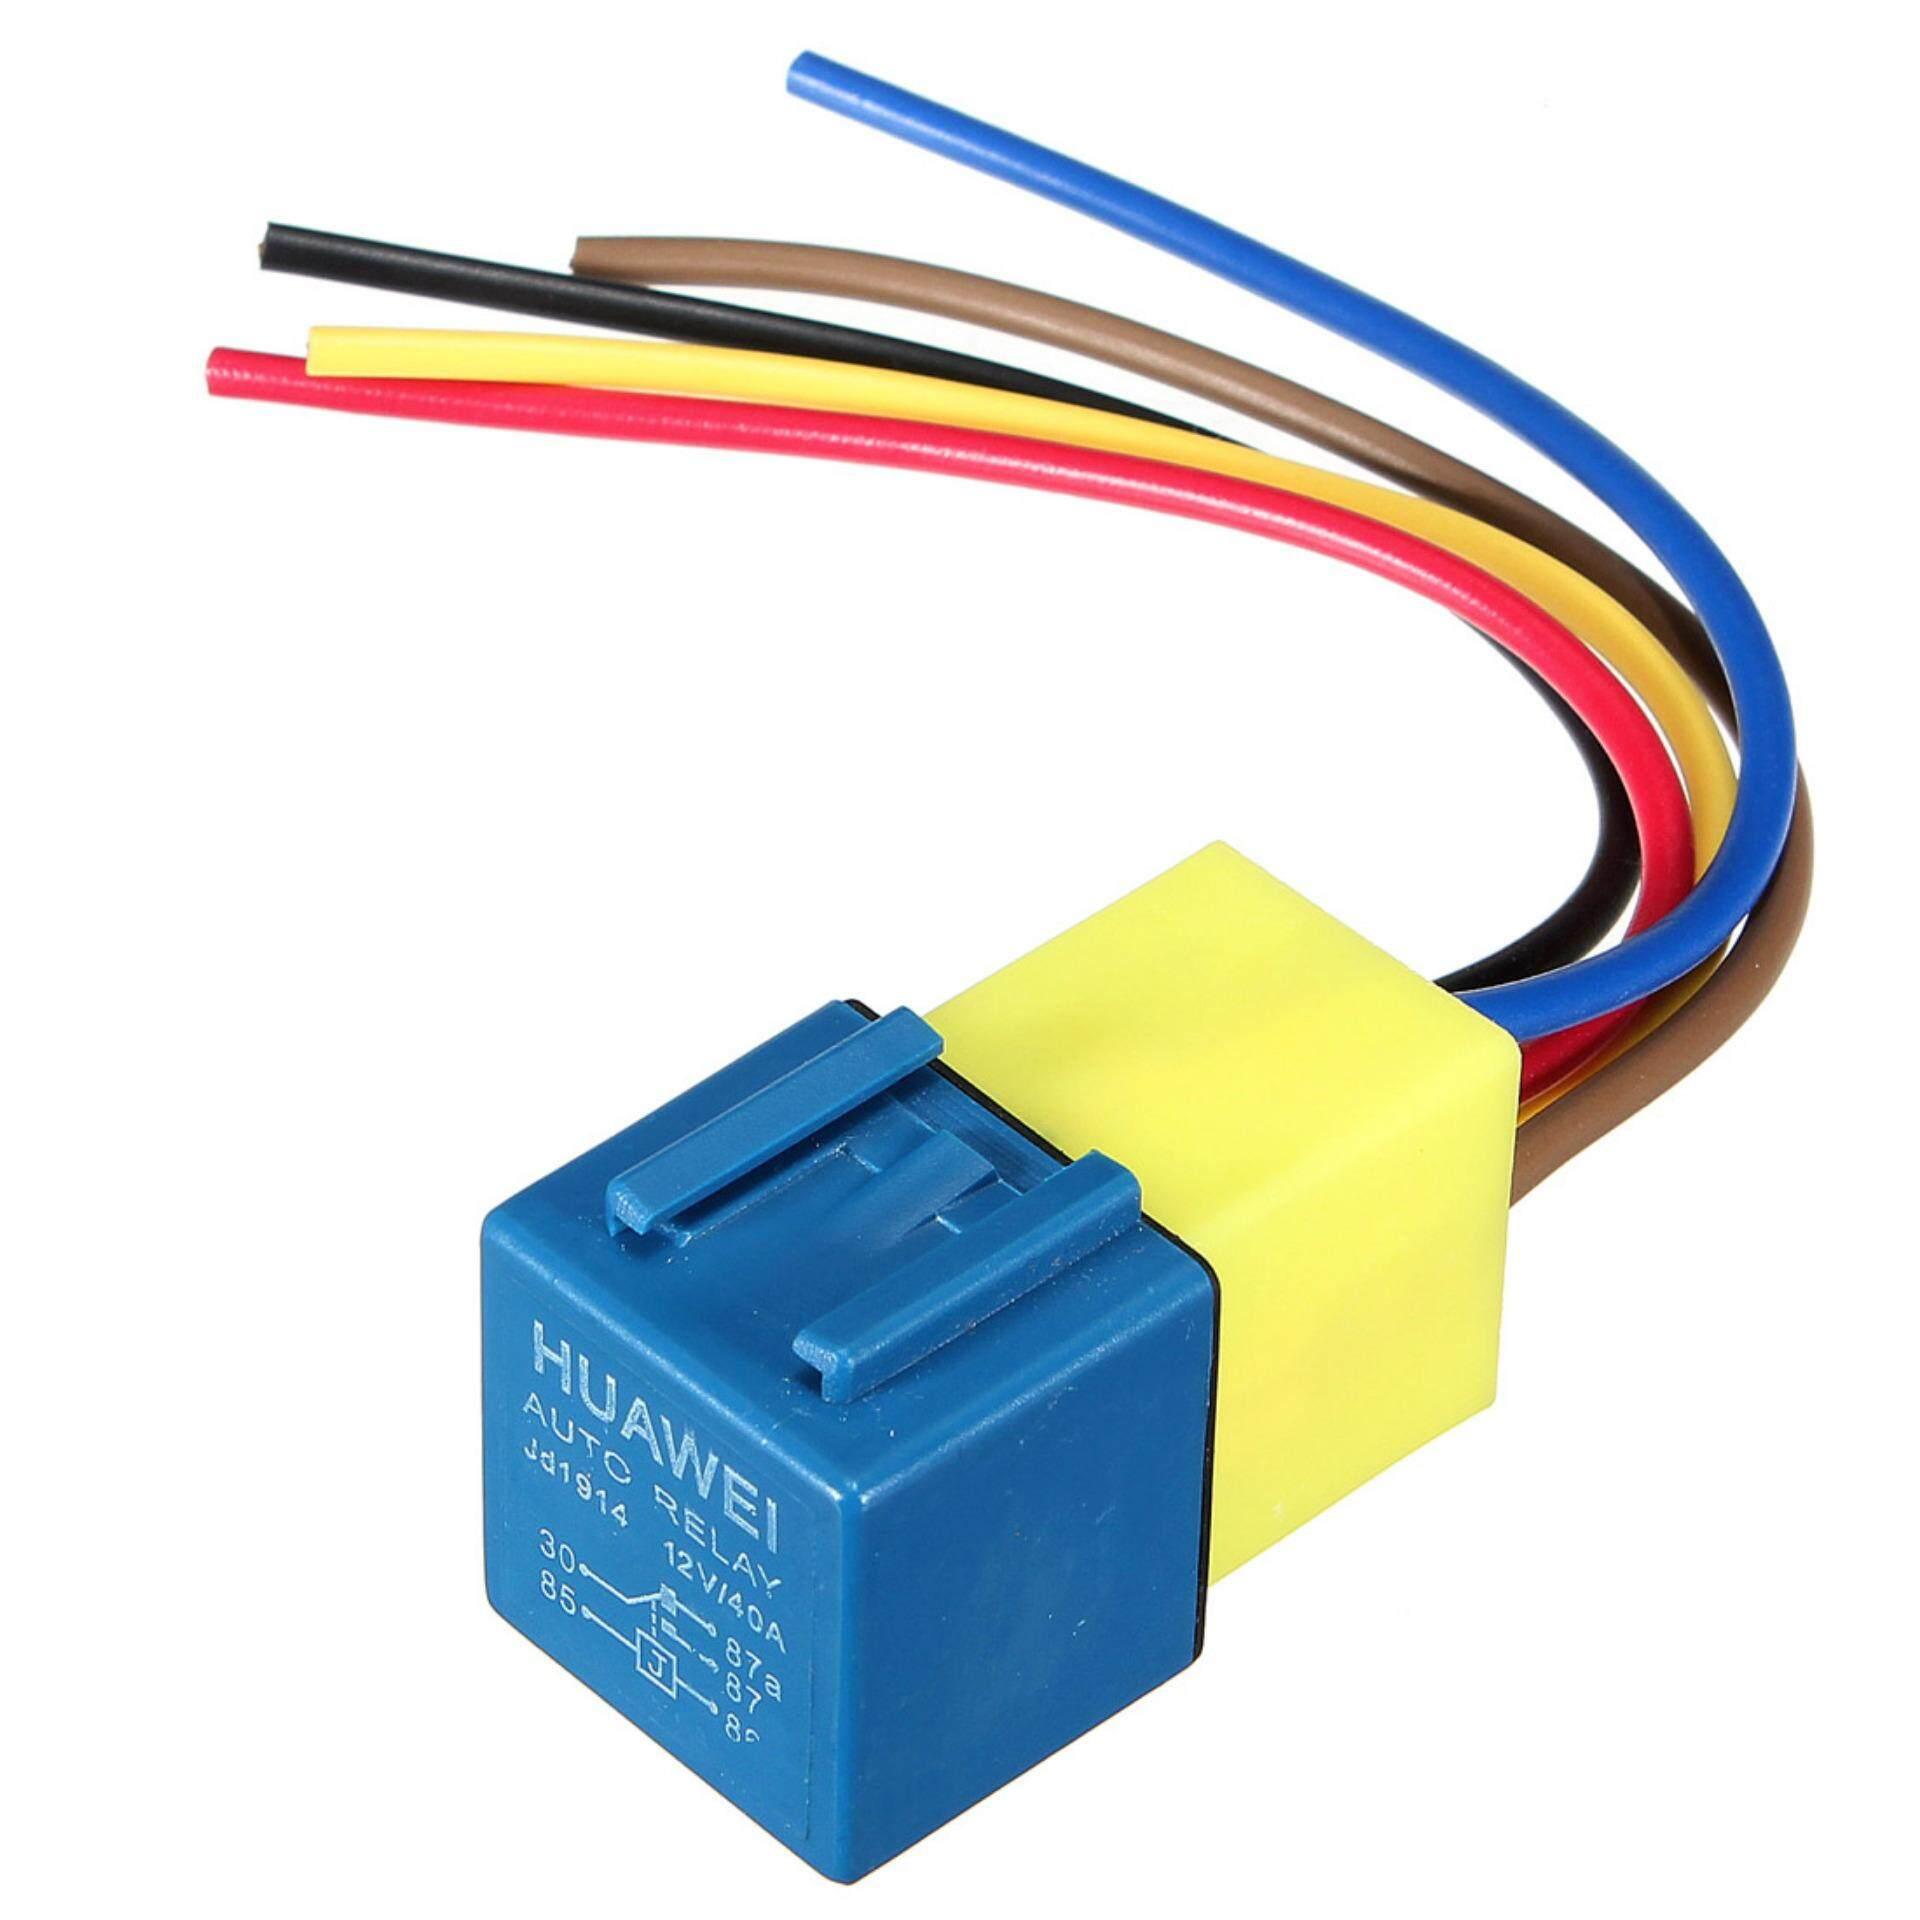 95 Neon Wiring Harness Pin 6 Pin Trailer Wiring Harness Wiring